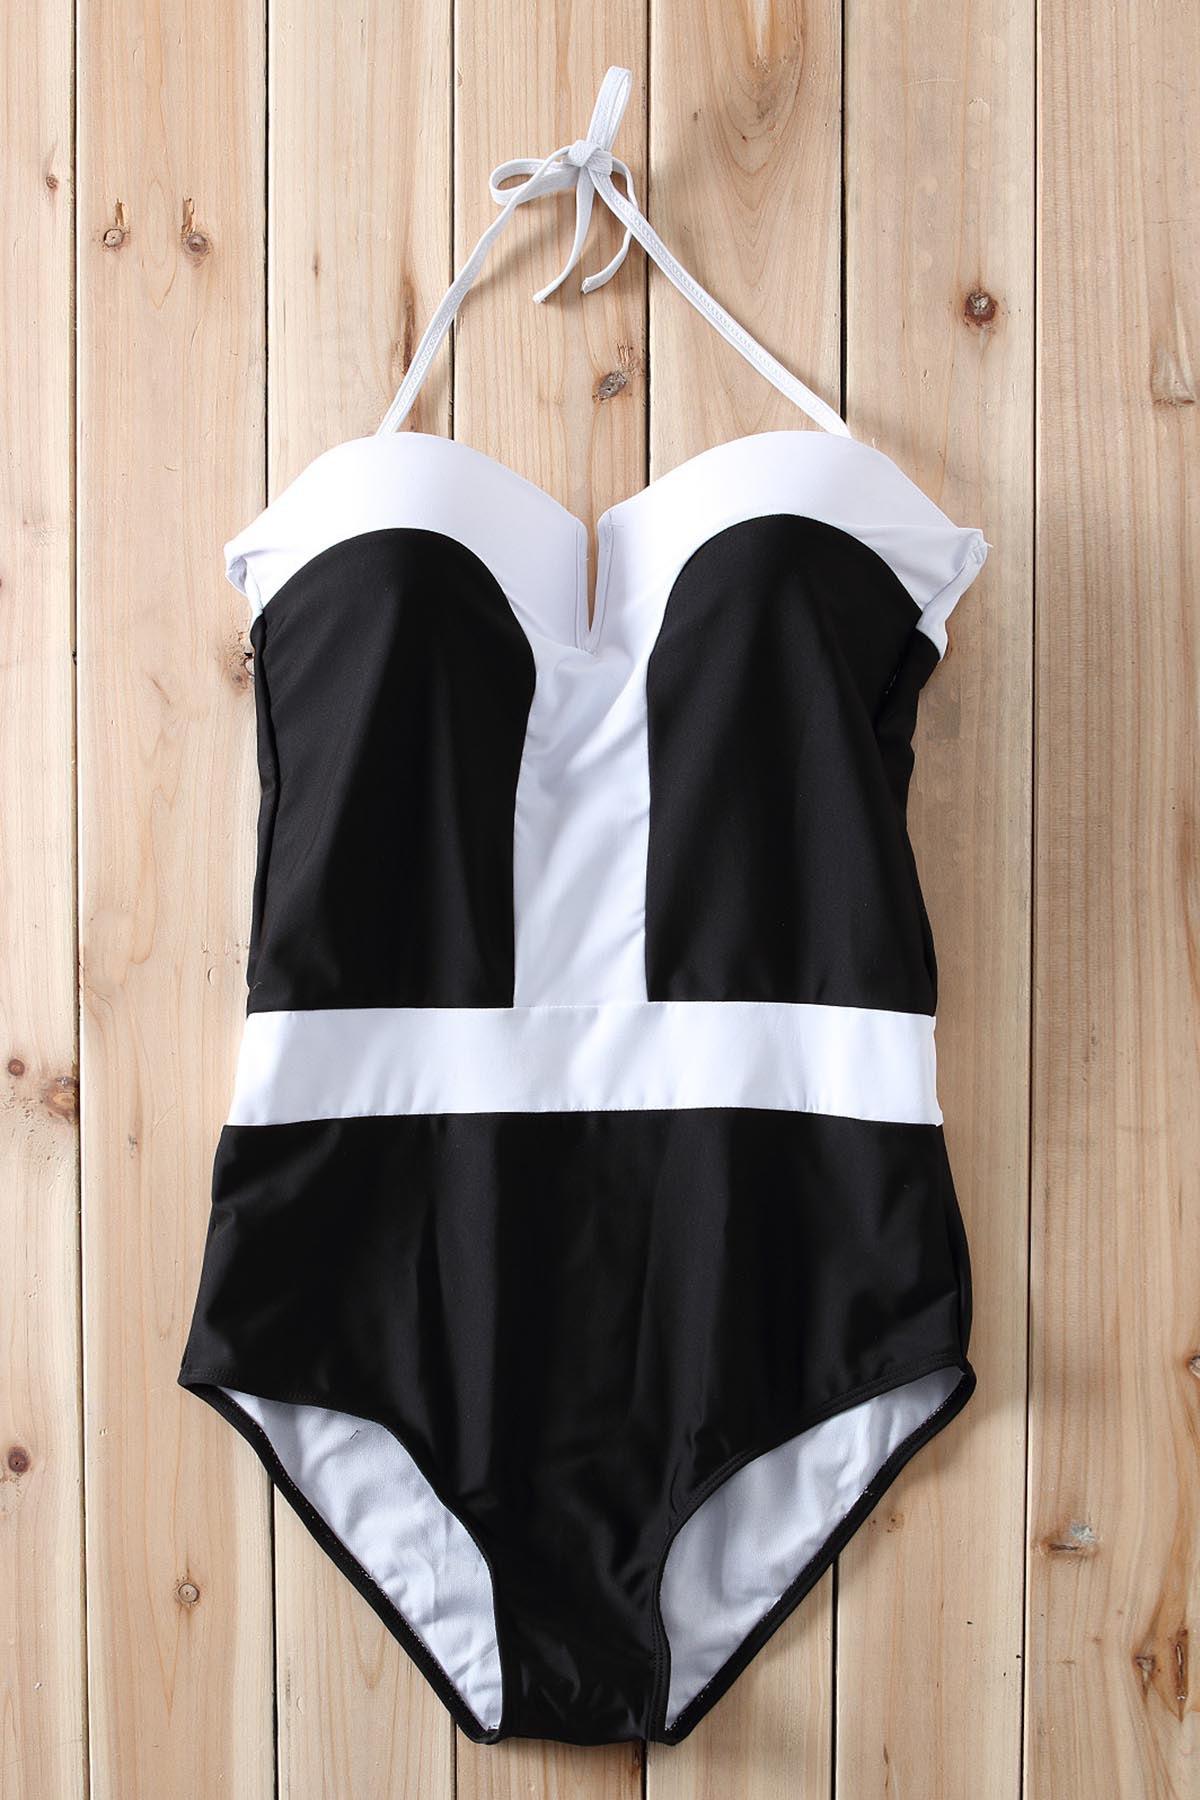 Strapless Color Block Push Up One-Piece Swimwear